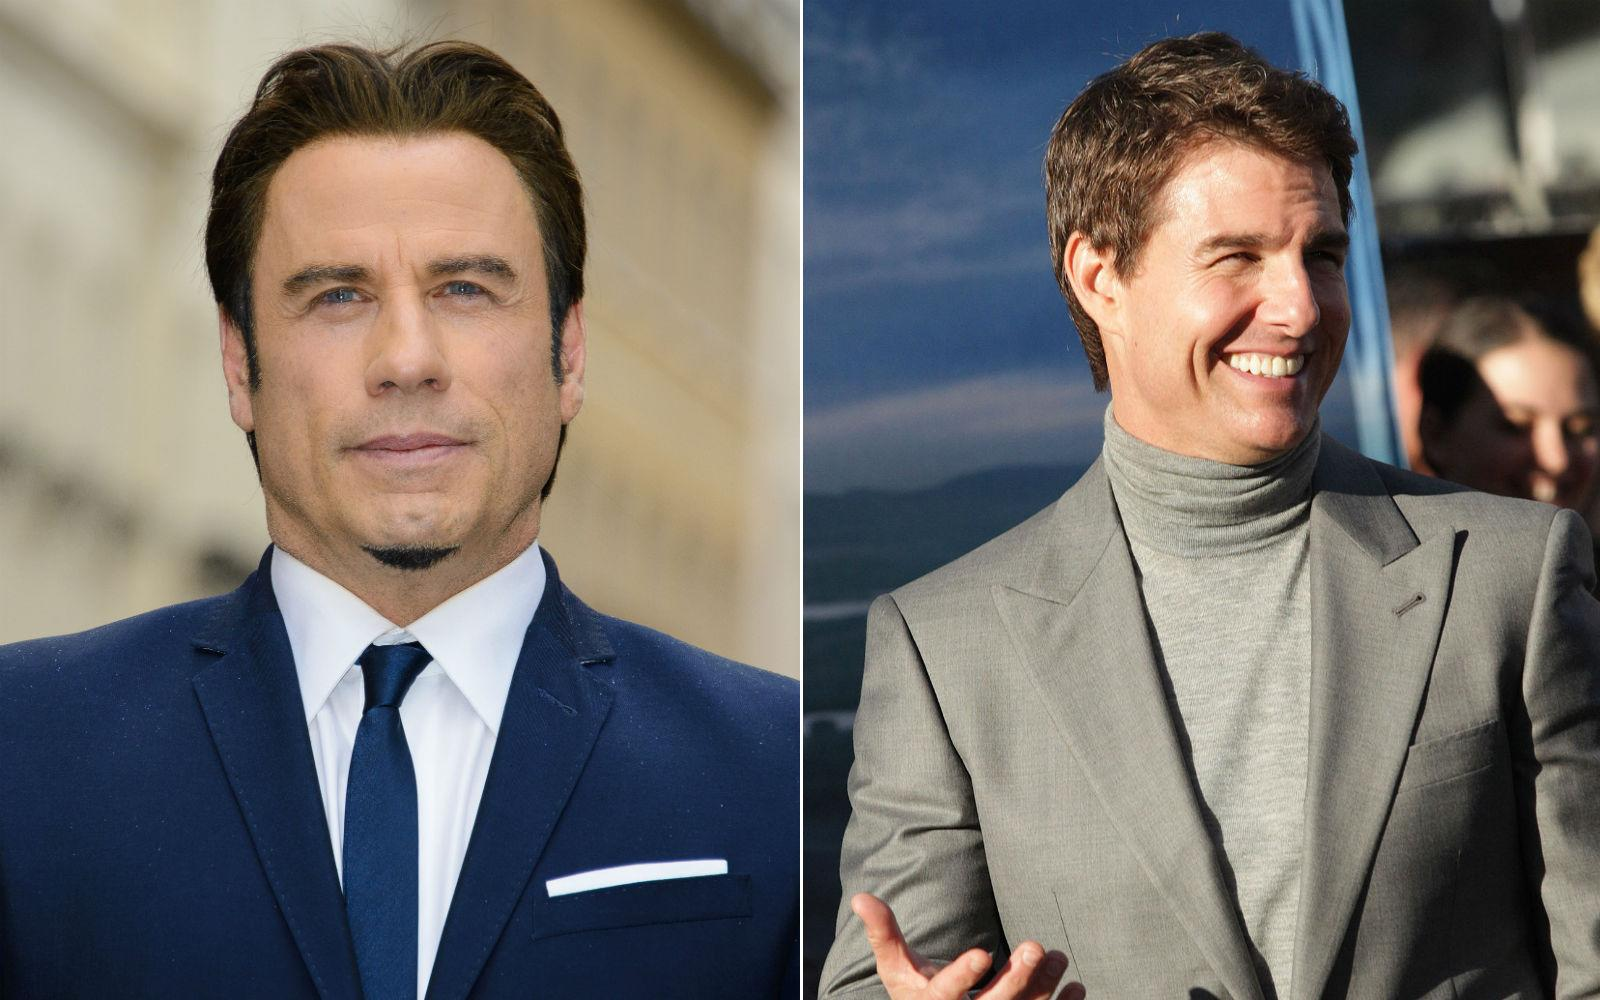 Tom Cruise and John Travolta 'despise each other', claims ex-Scientology bodyguard